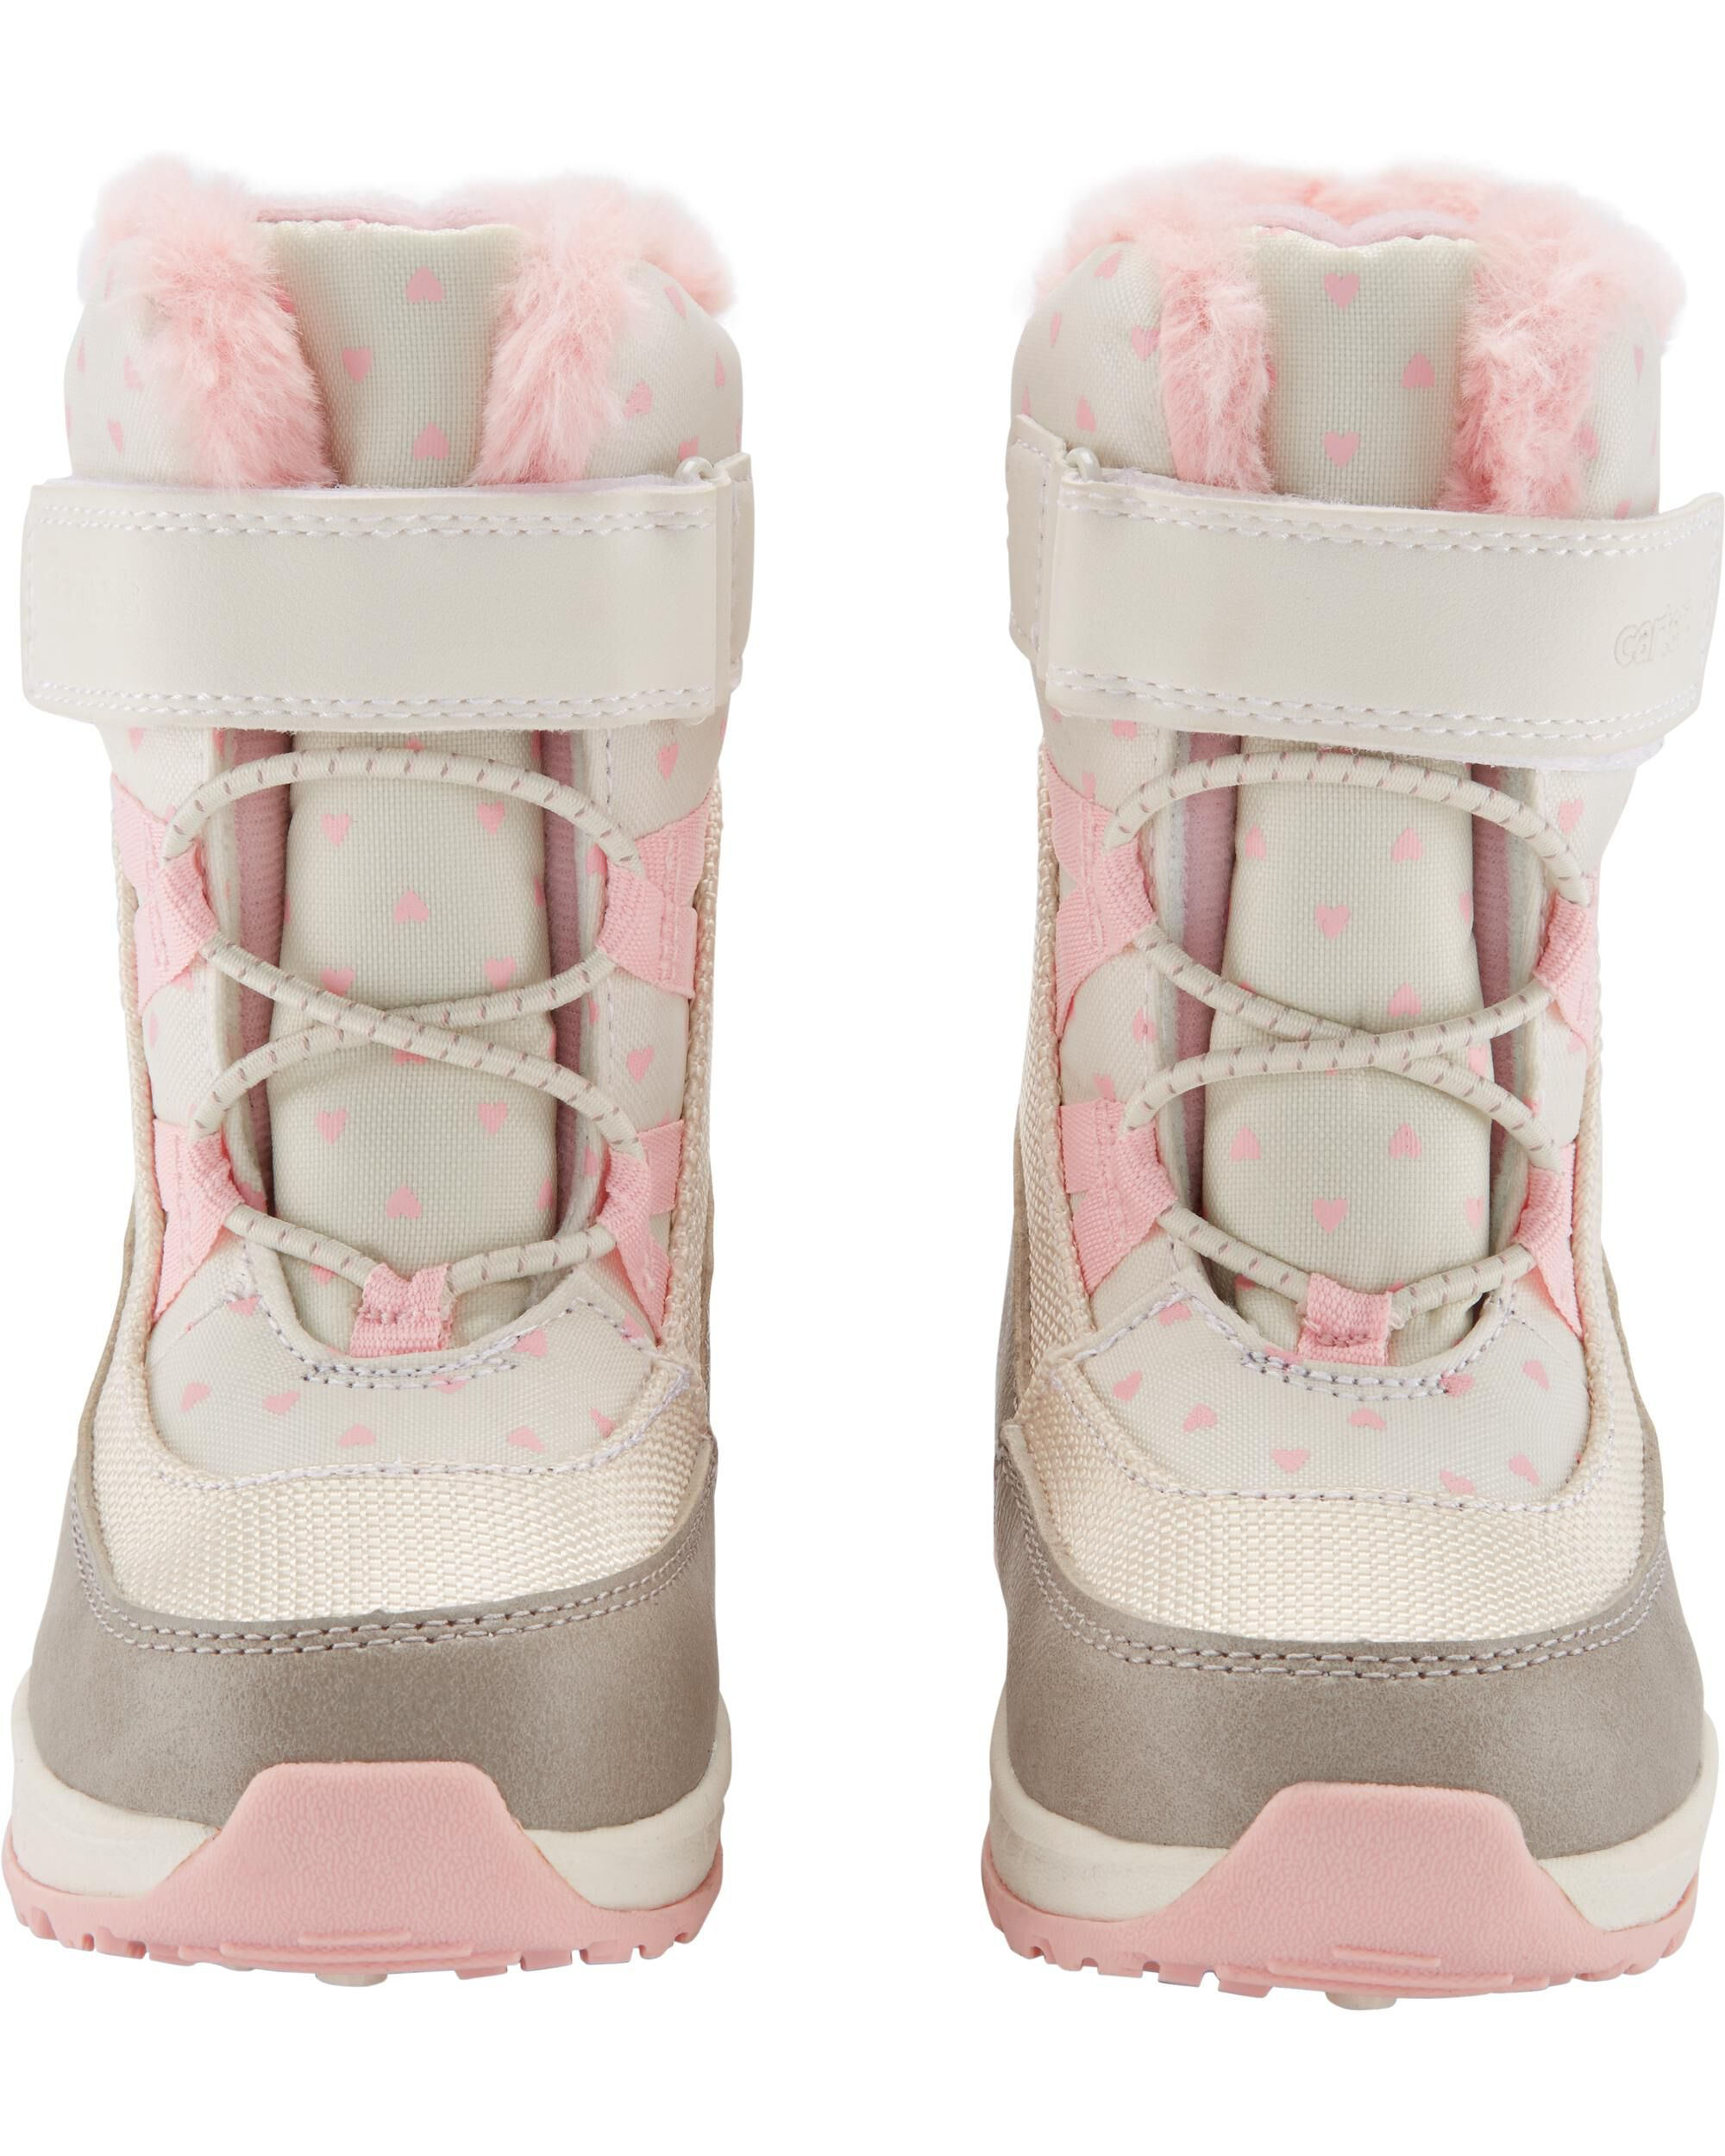 Carter's Snow Boots